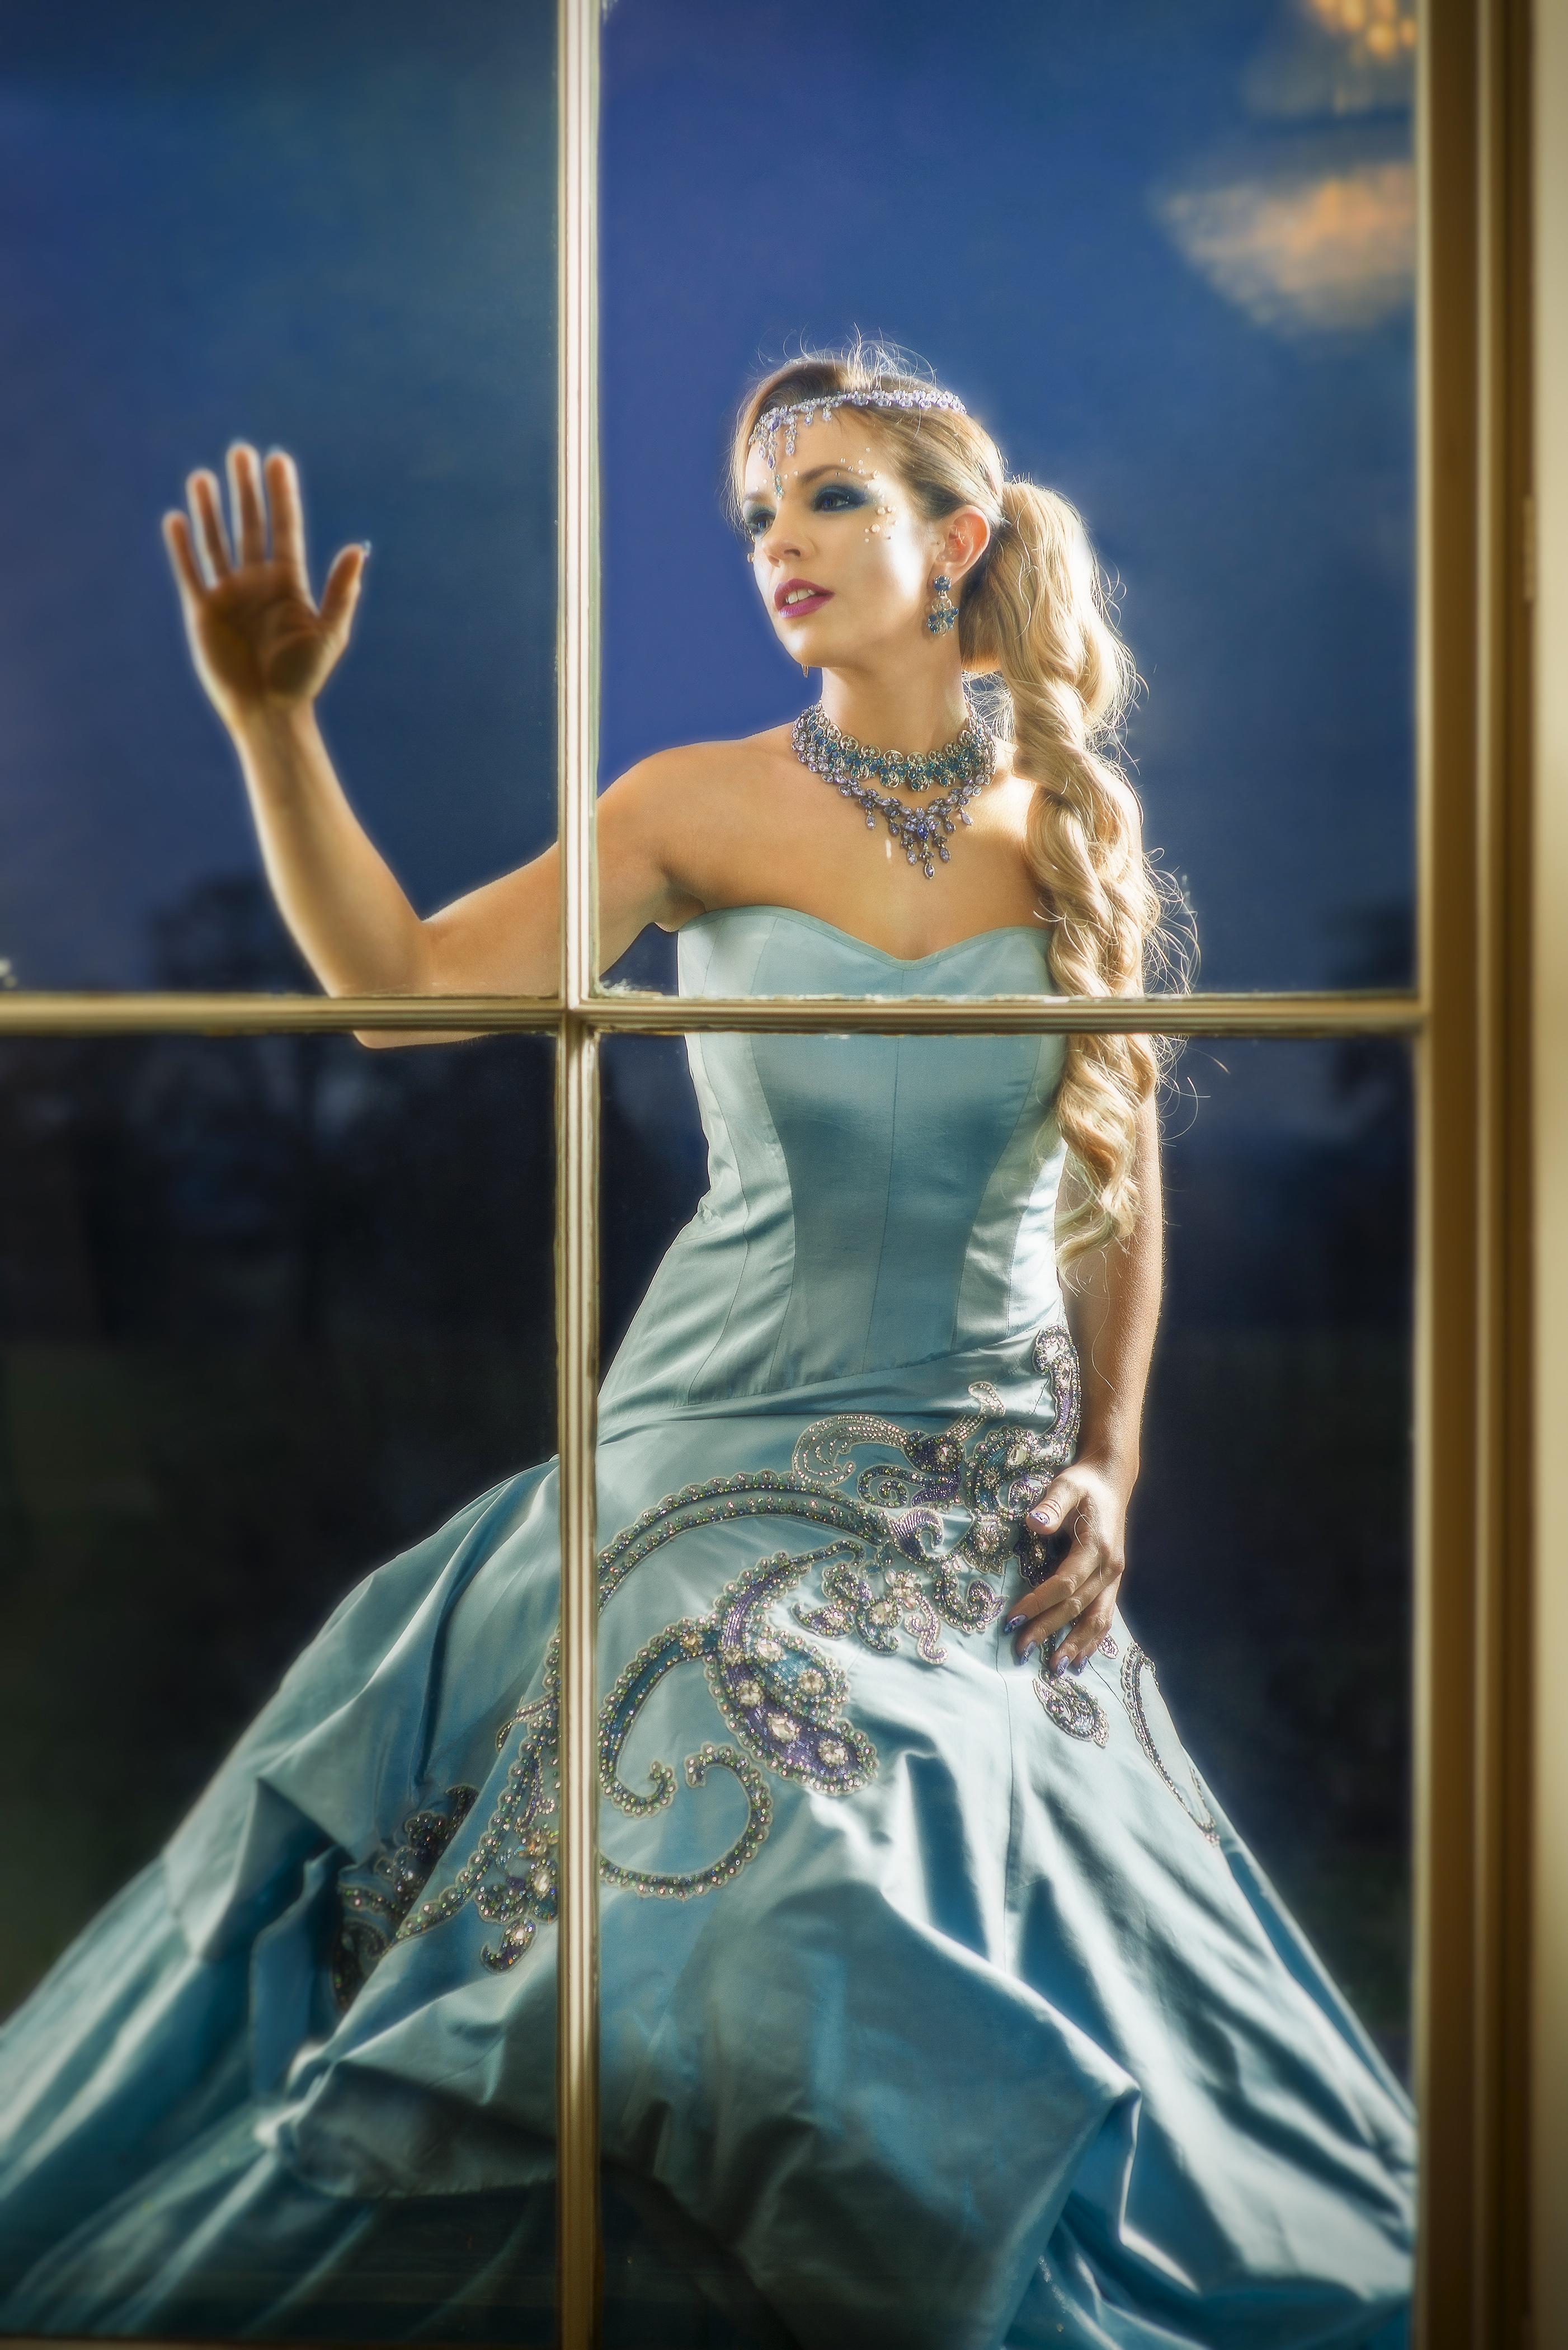 Fashion_Cinderella-614-John Ferguson